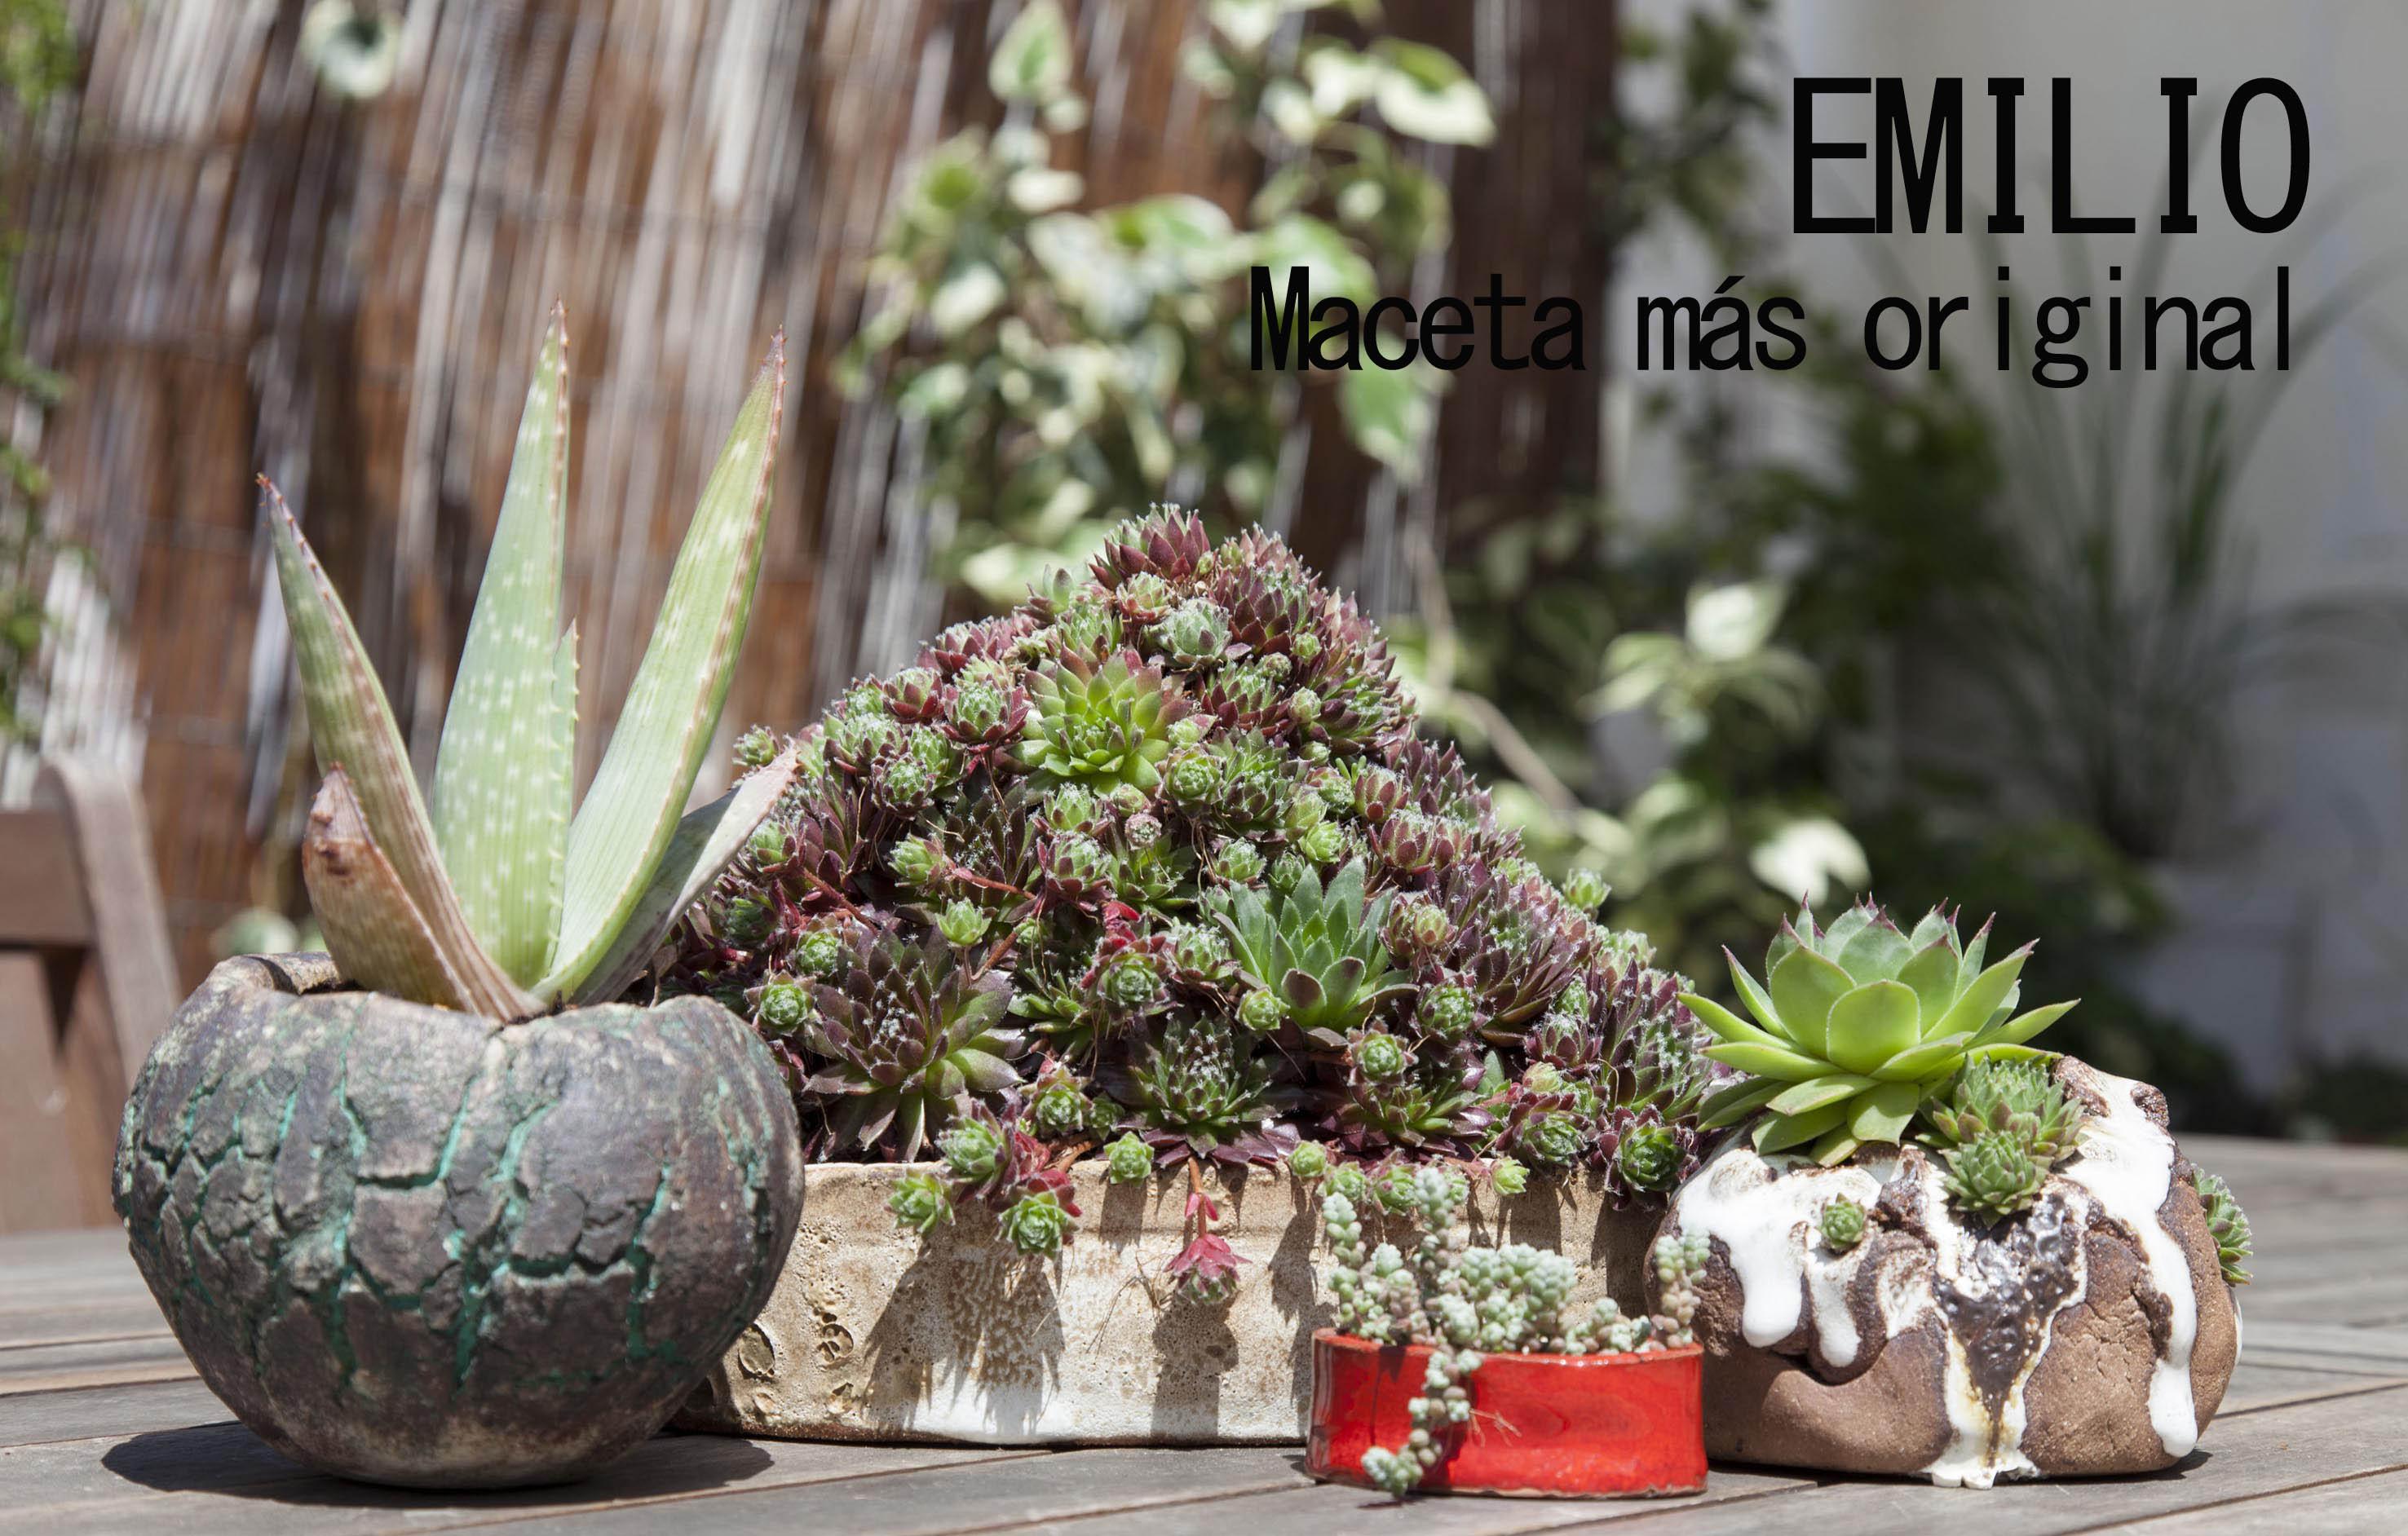 Emillio_maceta_roriginal_rebrota_malasana_rojomenta_ganadores_concurso_balcones_madrid